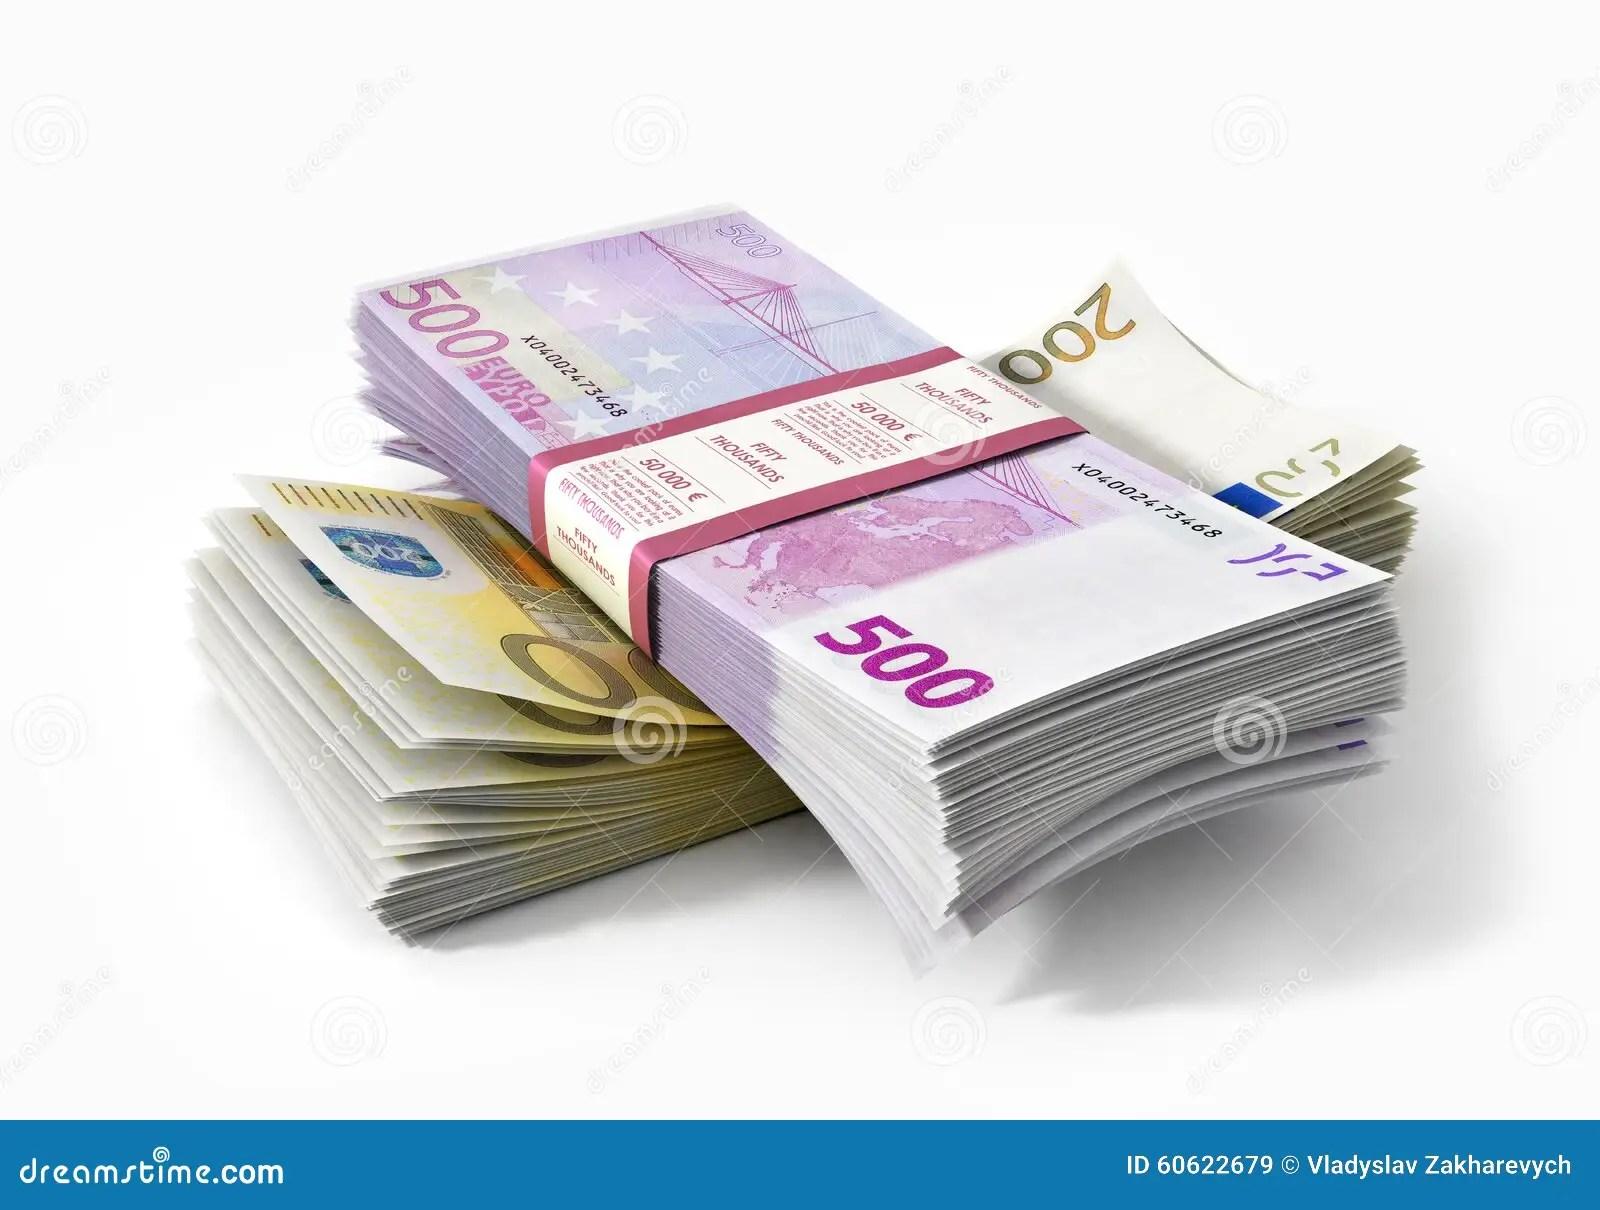 Stacks Of Euros Money Stock Image Image Of Savings